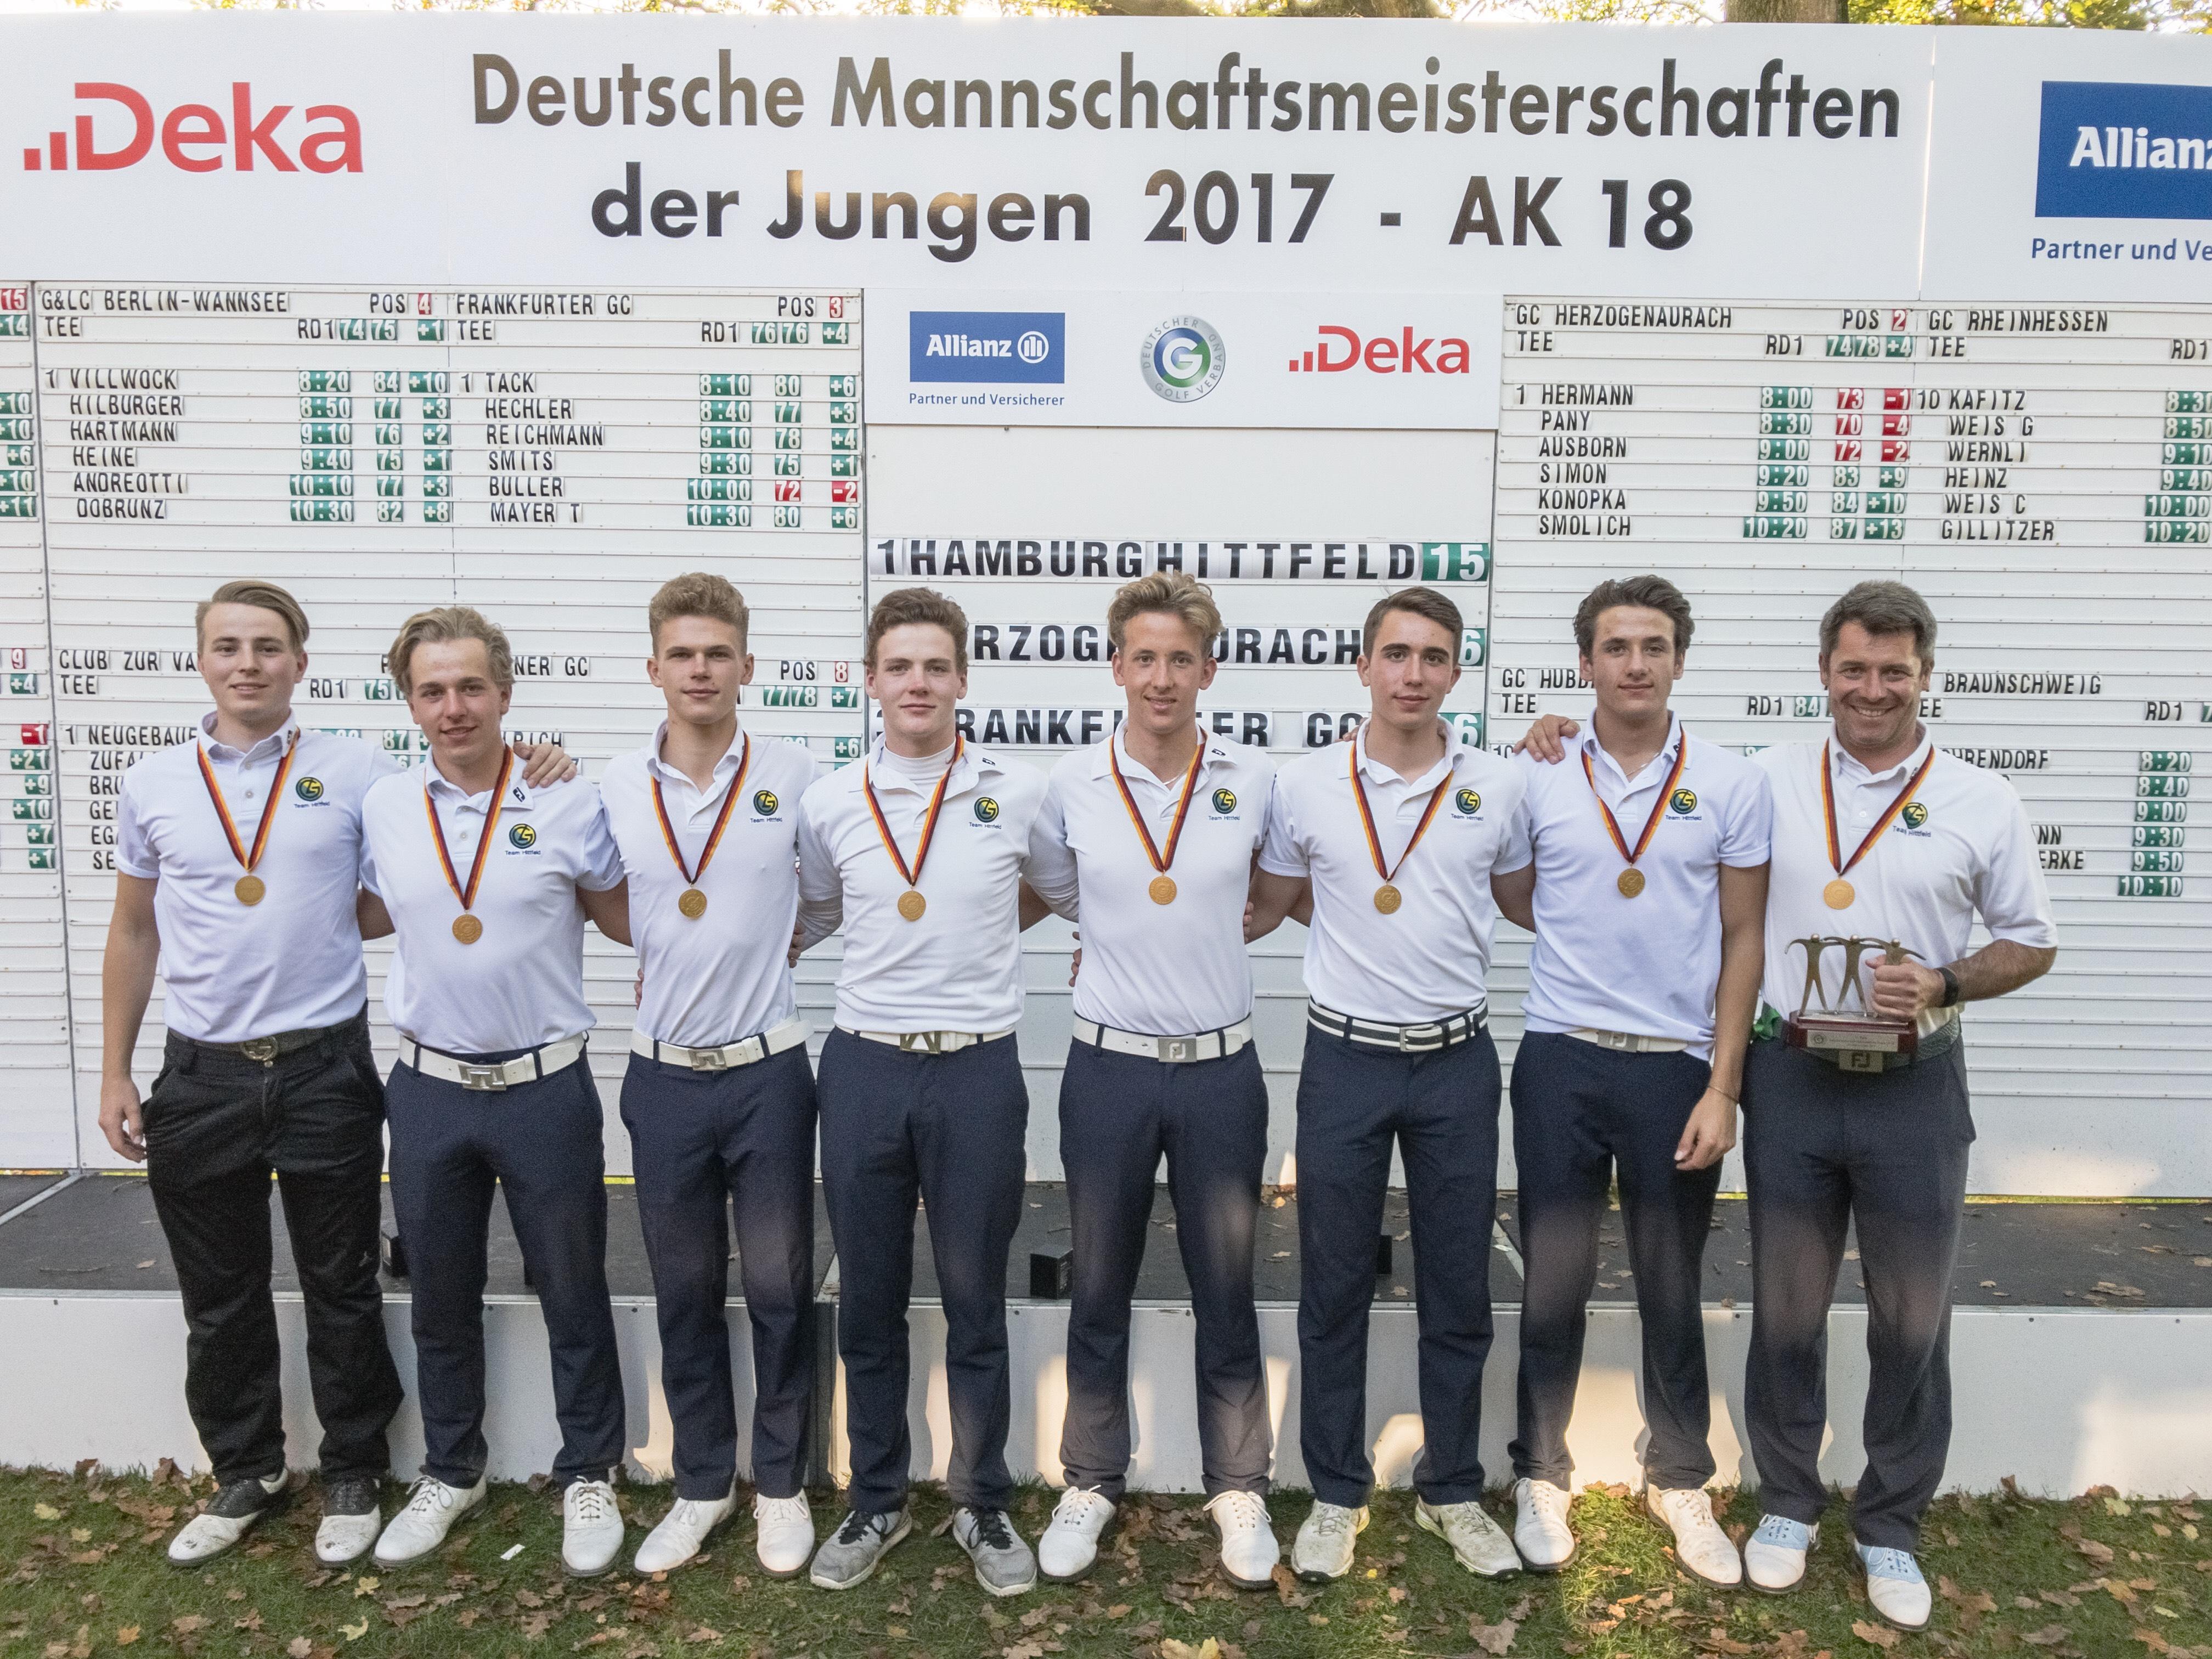 17-10-02 DMM Jungen AK 18 Sieger Hamburg@LangerSportmarketing